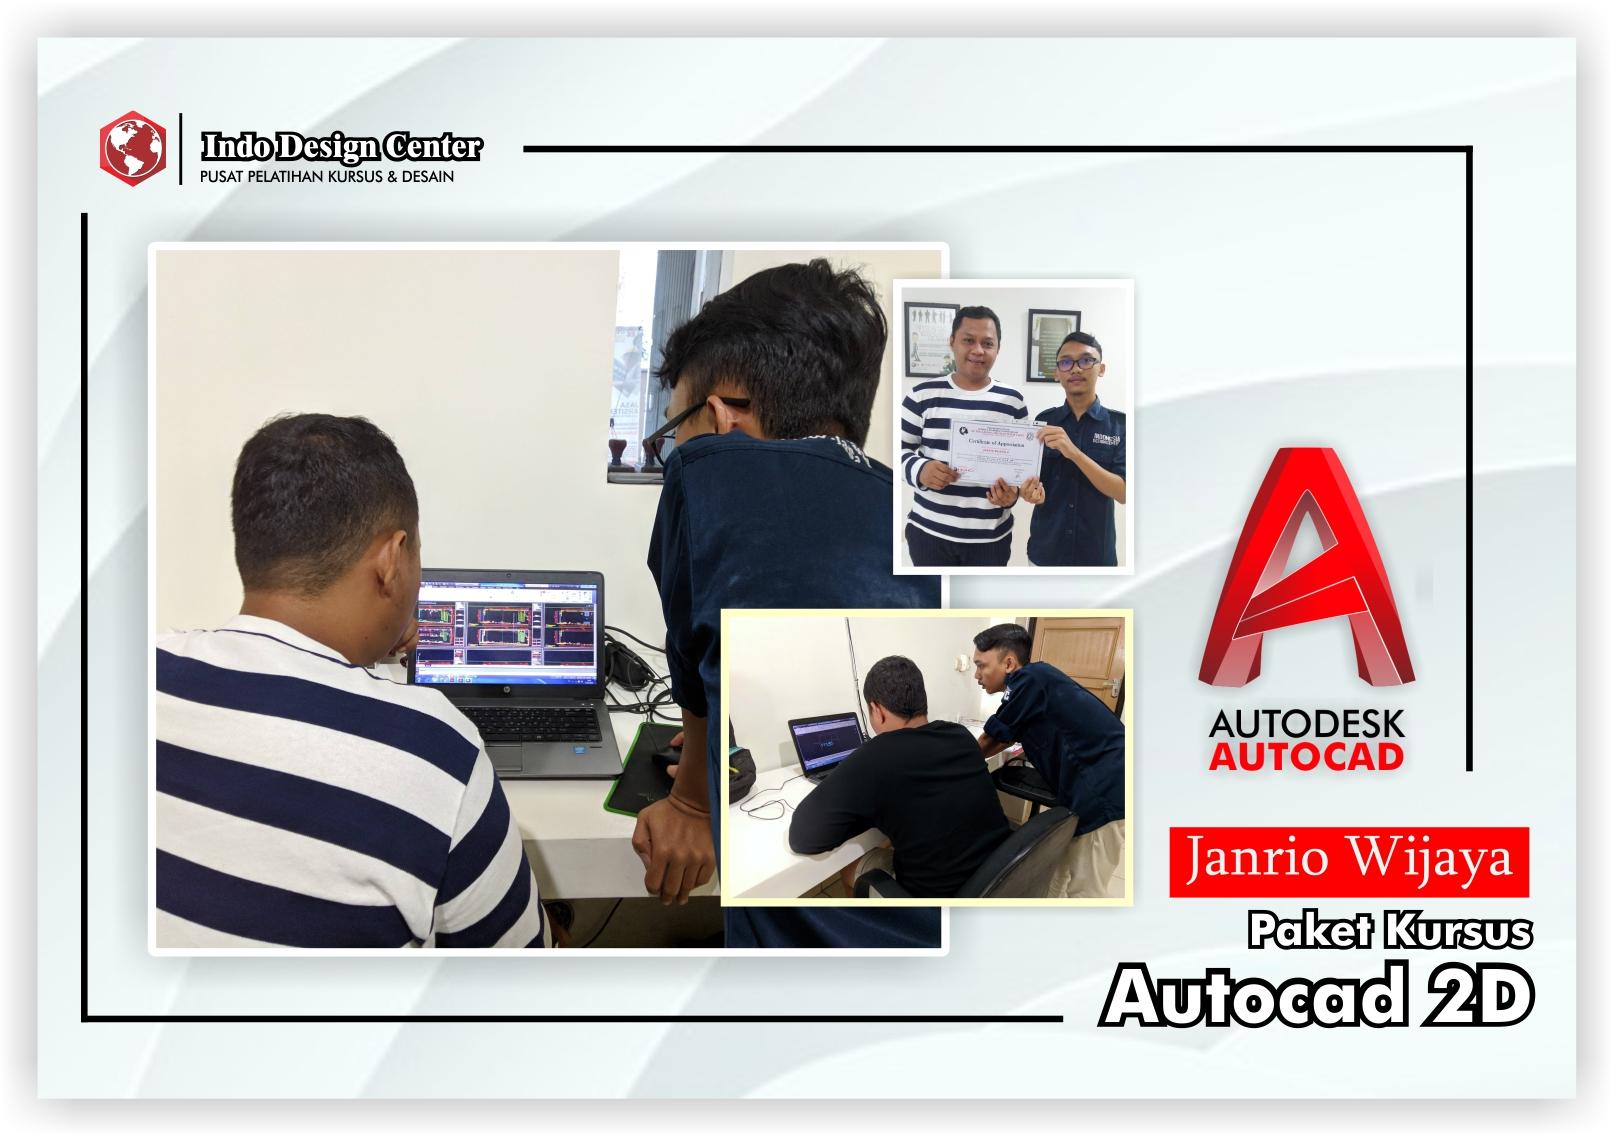 Kursus-AutoCAD-2D-Pak-Janrio-Wijaya-Indo-Design-Center-Tangerang-Header